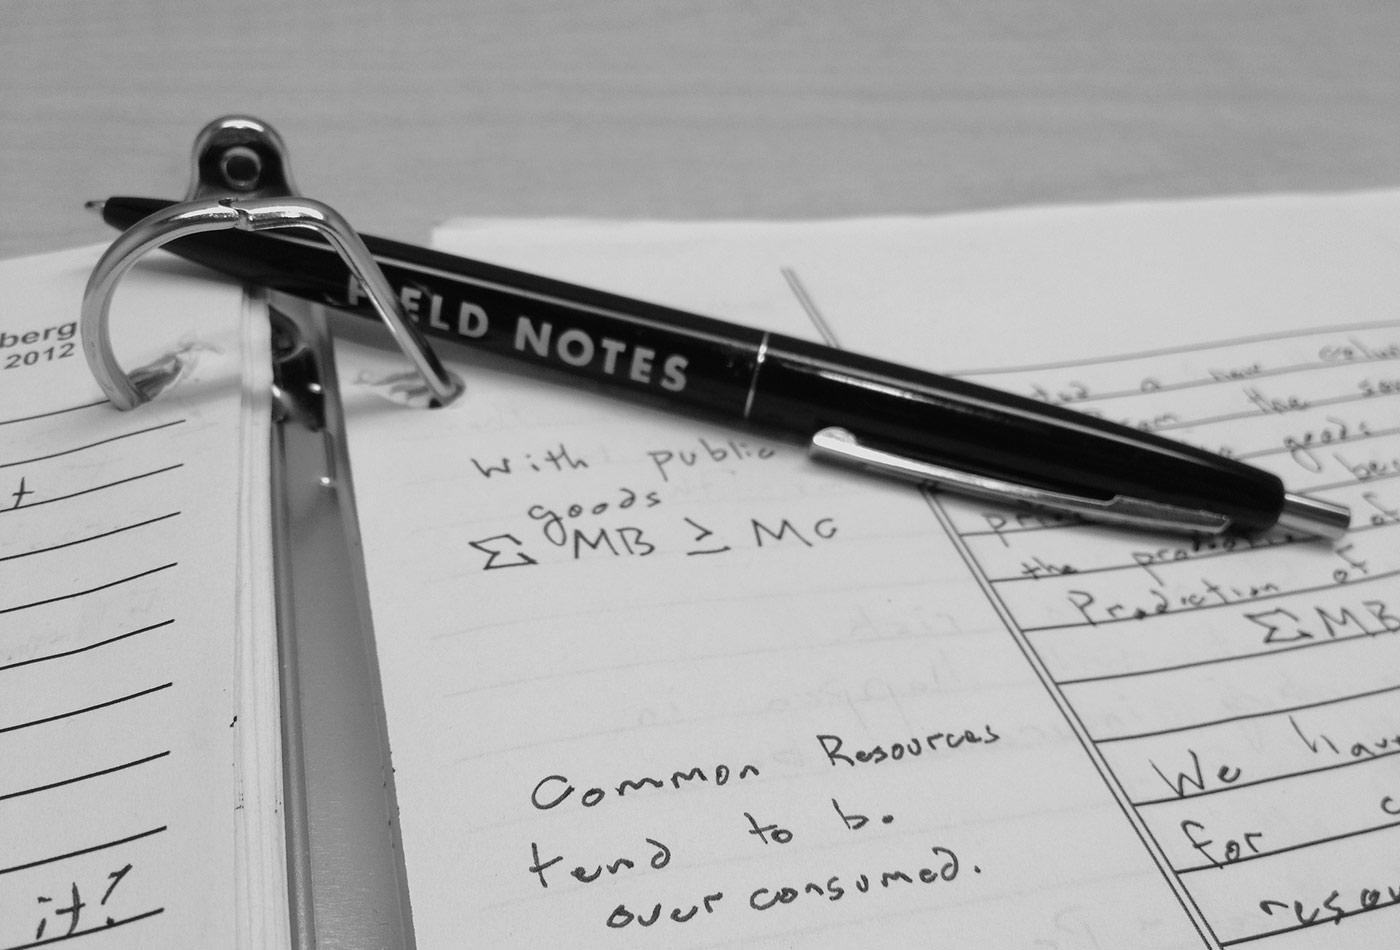 Field notes + economics.